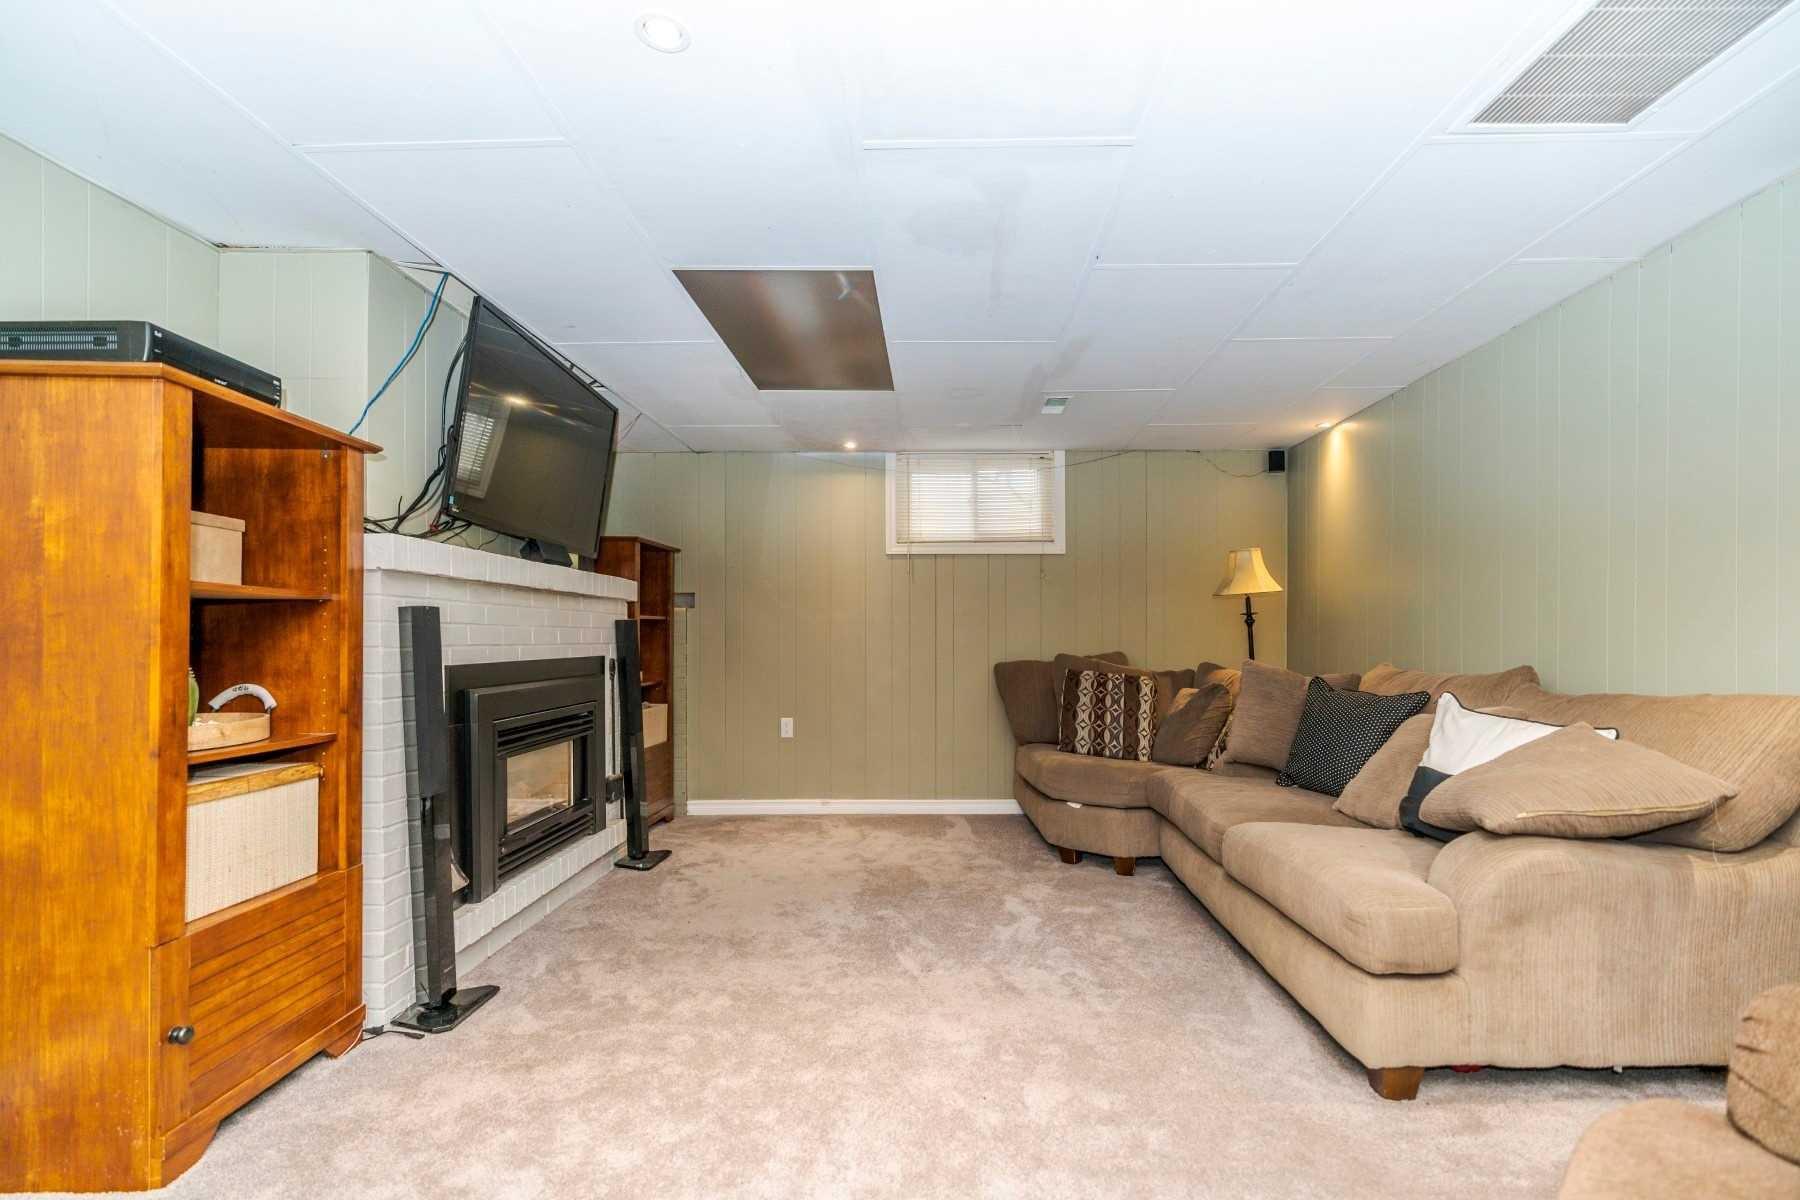 Photo 17: Photos: 190 N Church Street in Clarington: Orono House (Sidesplit 4) for sale : MLS®# E4463047